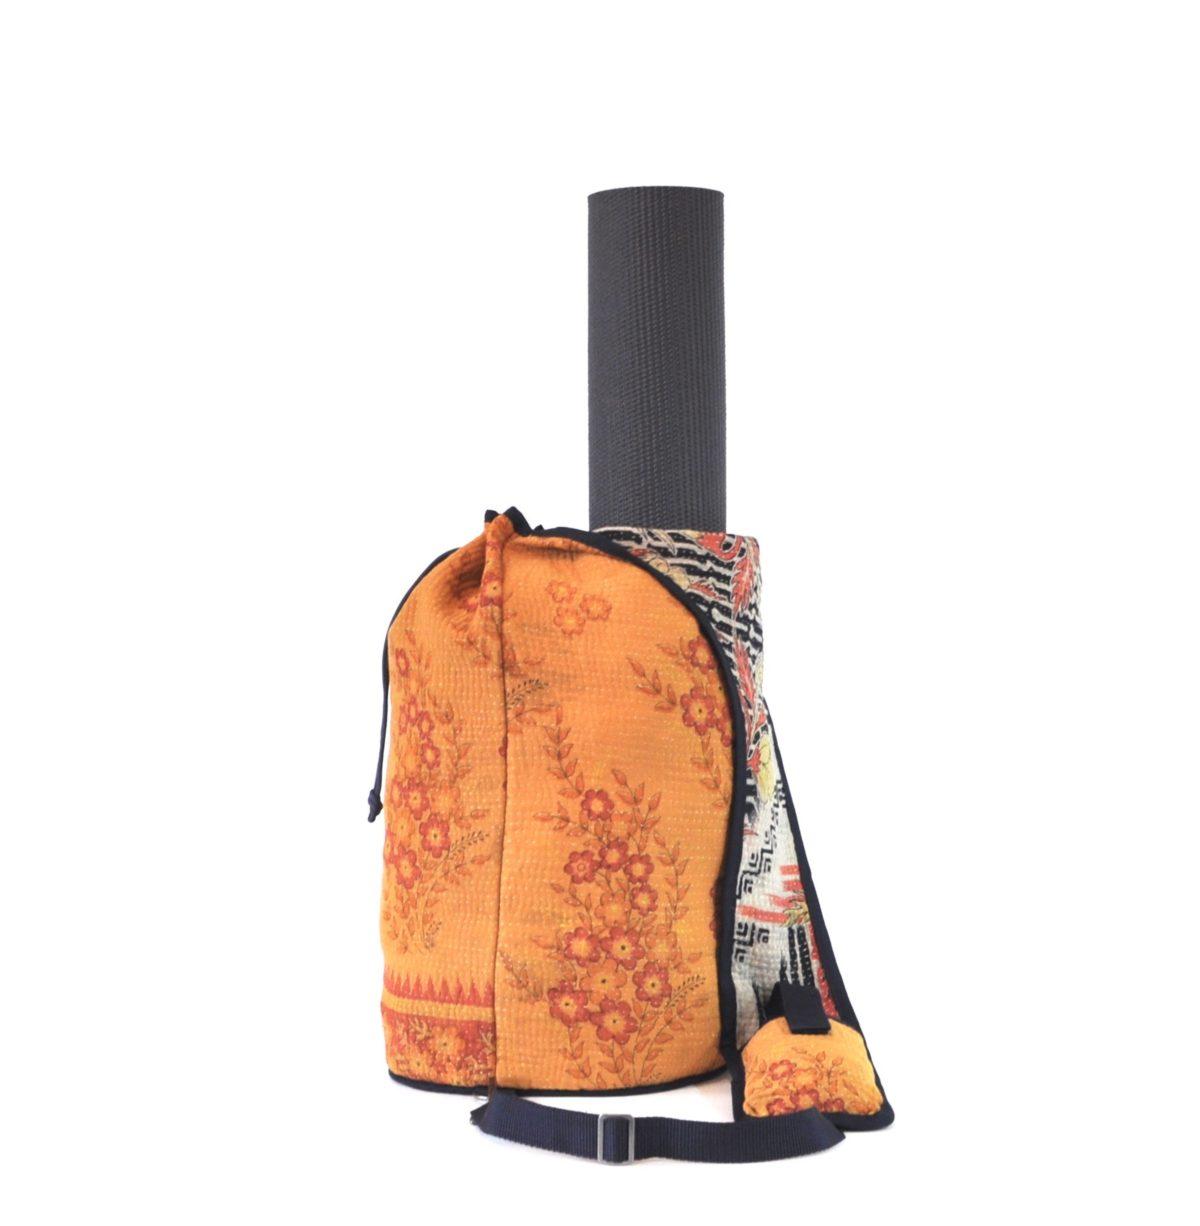 YESNESS Saffron w:Pale Red Flower Sprays 3